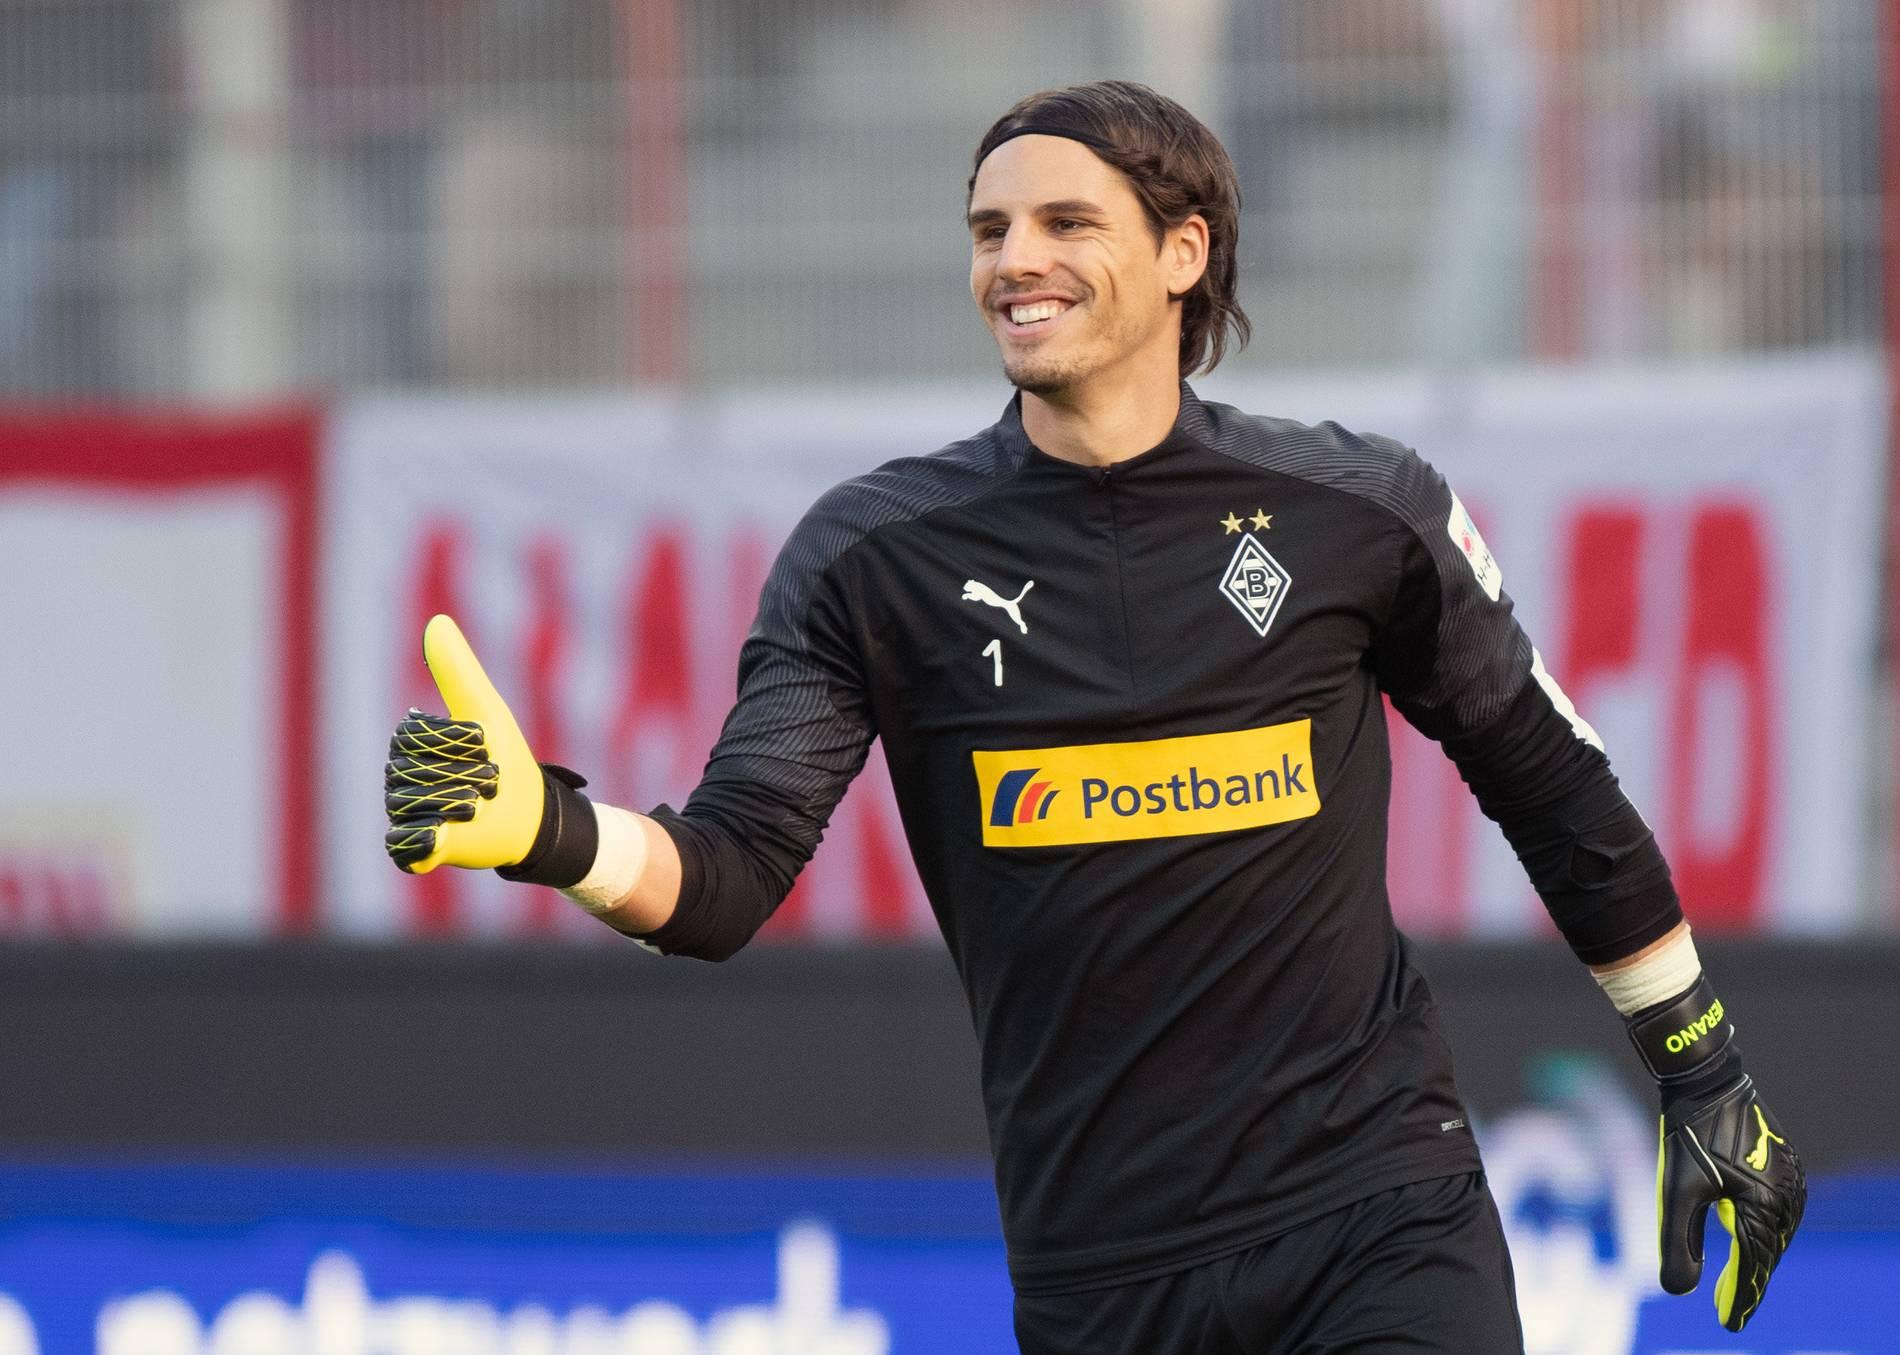 Instagram Borussia Mönchengladbach